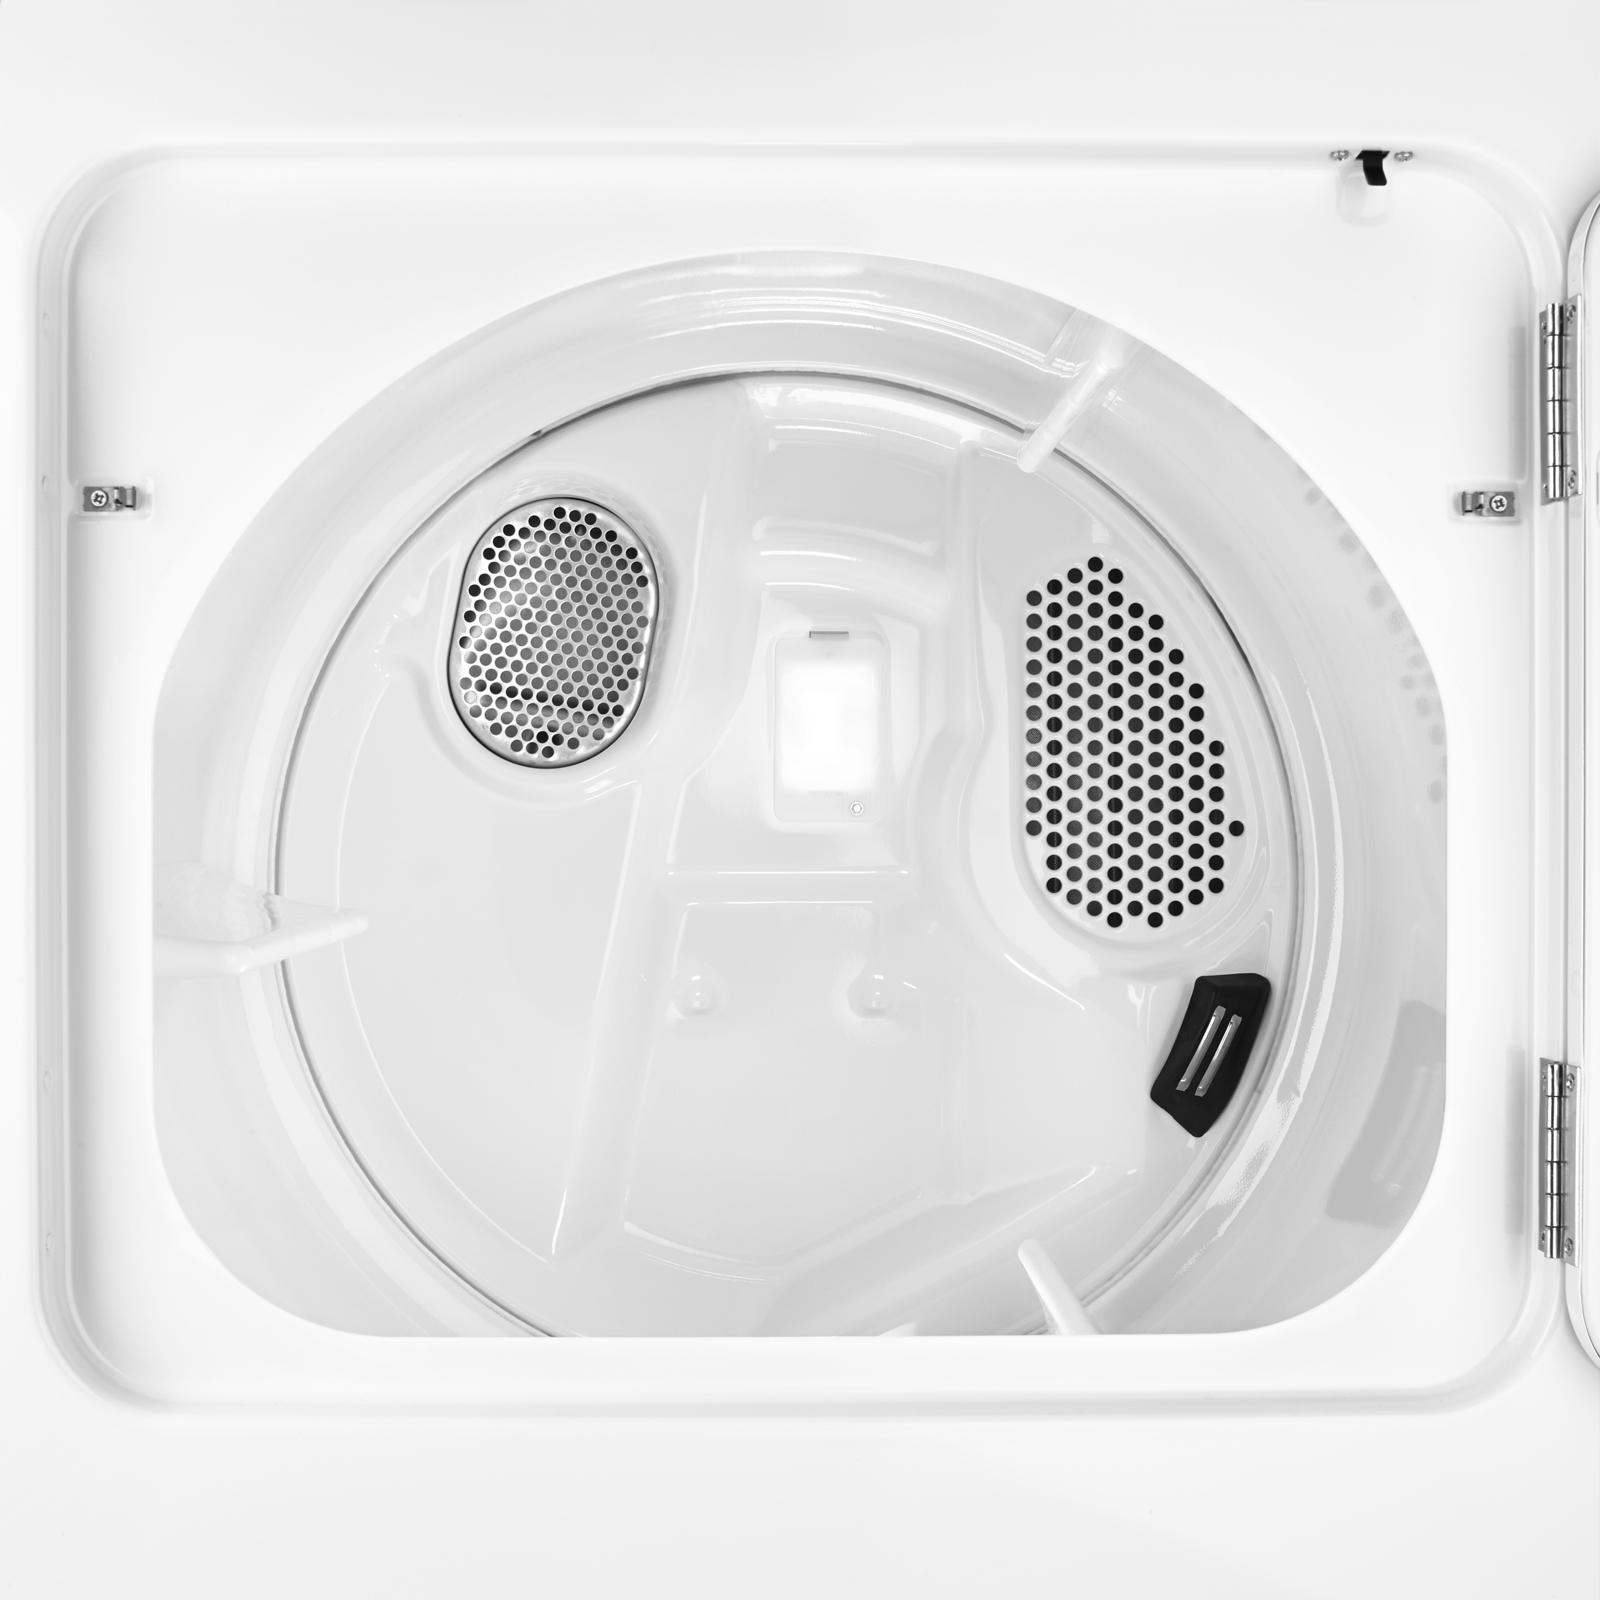 Maytag 7.0 cu. ft. Centennial® Electric Dryer w/ Wrinkle Control - White